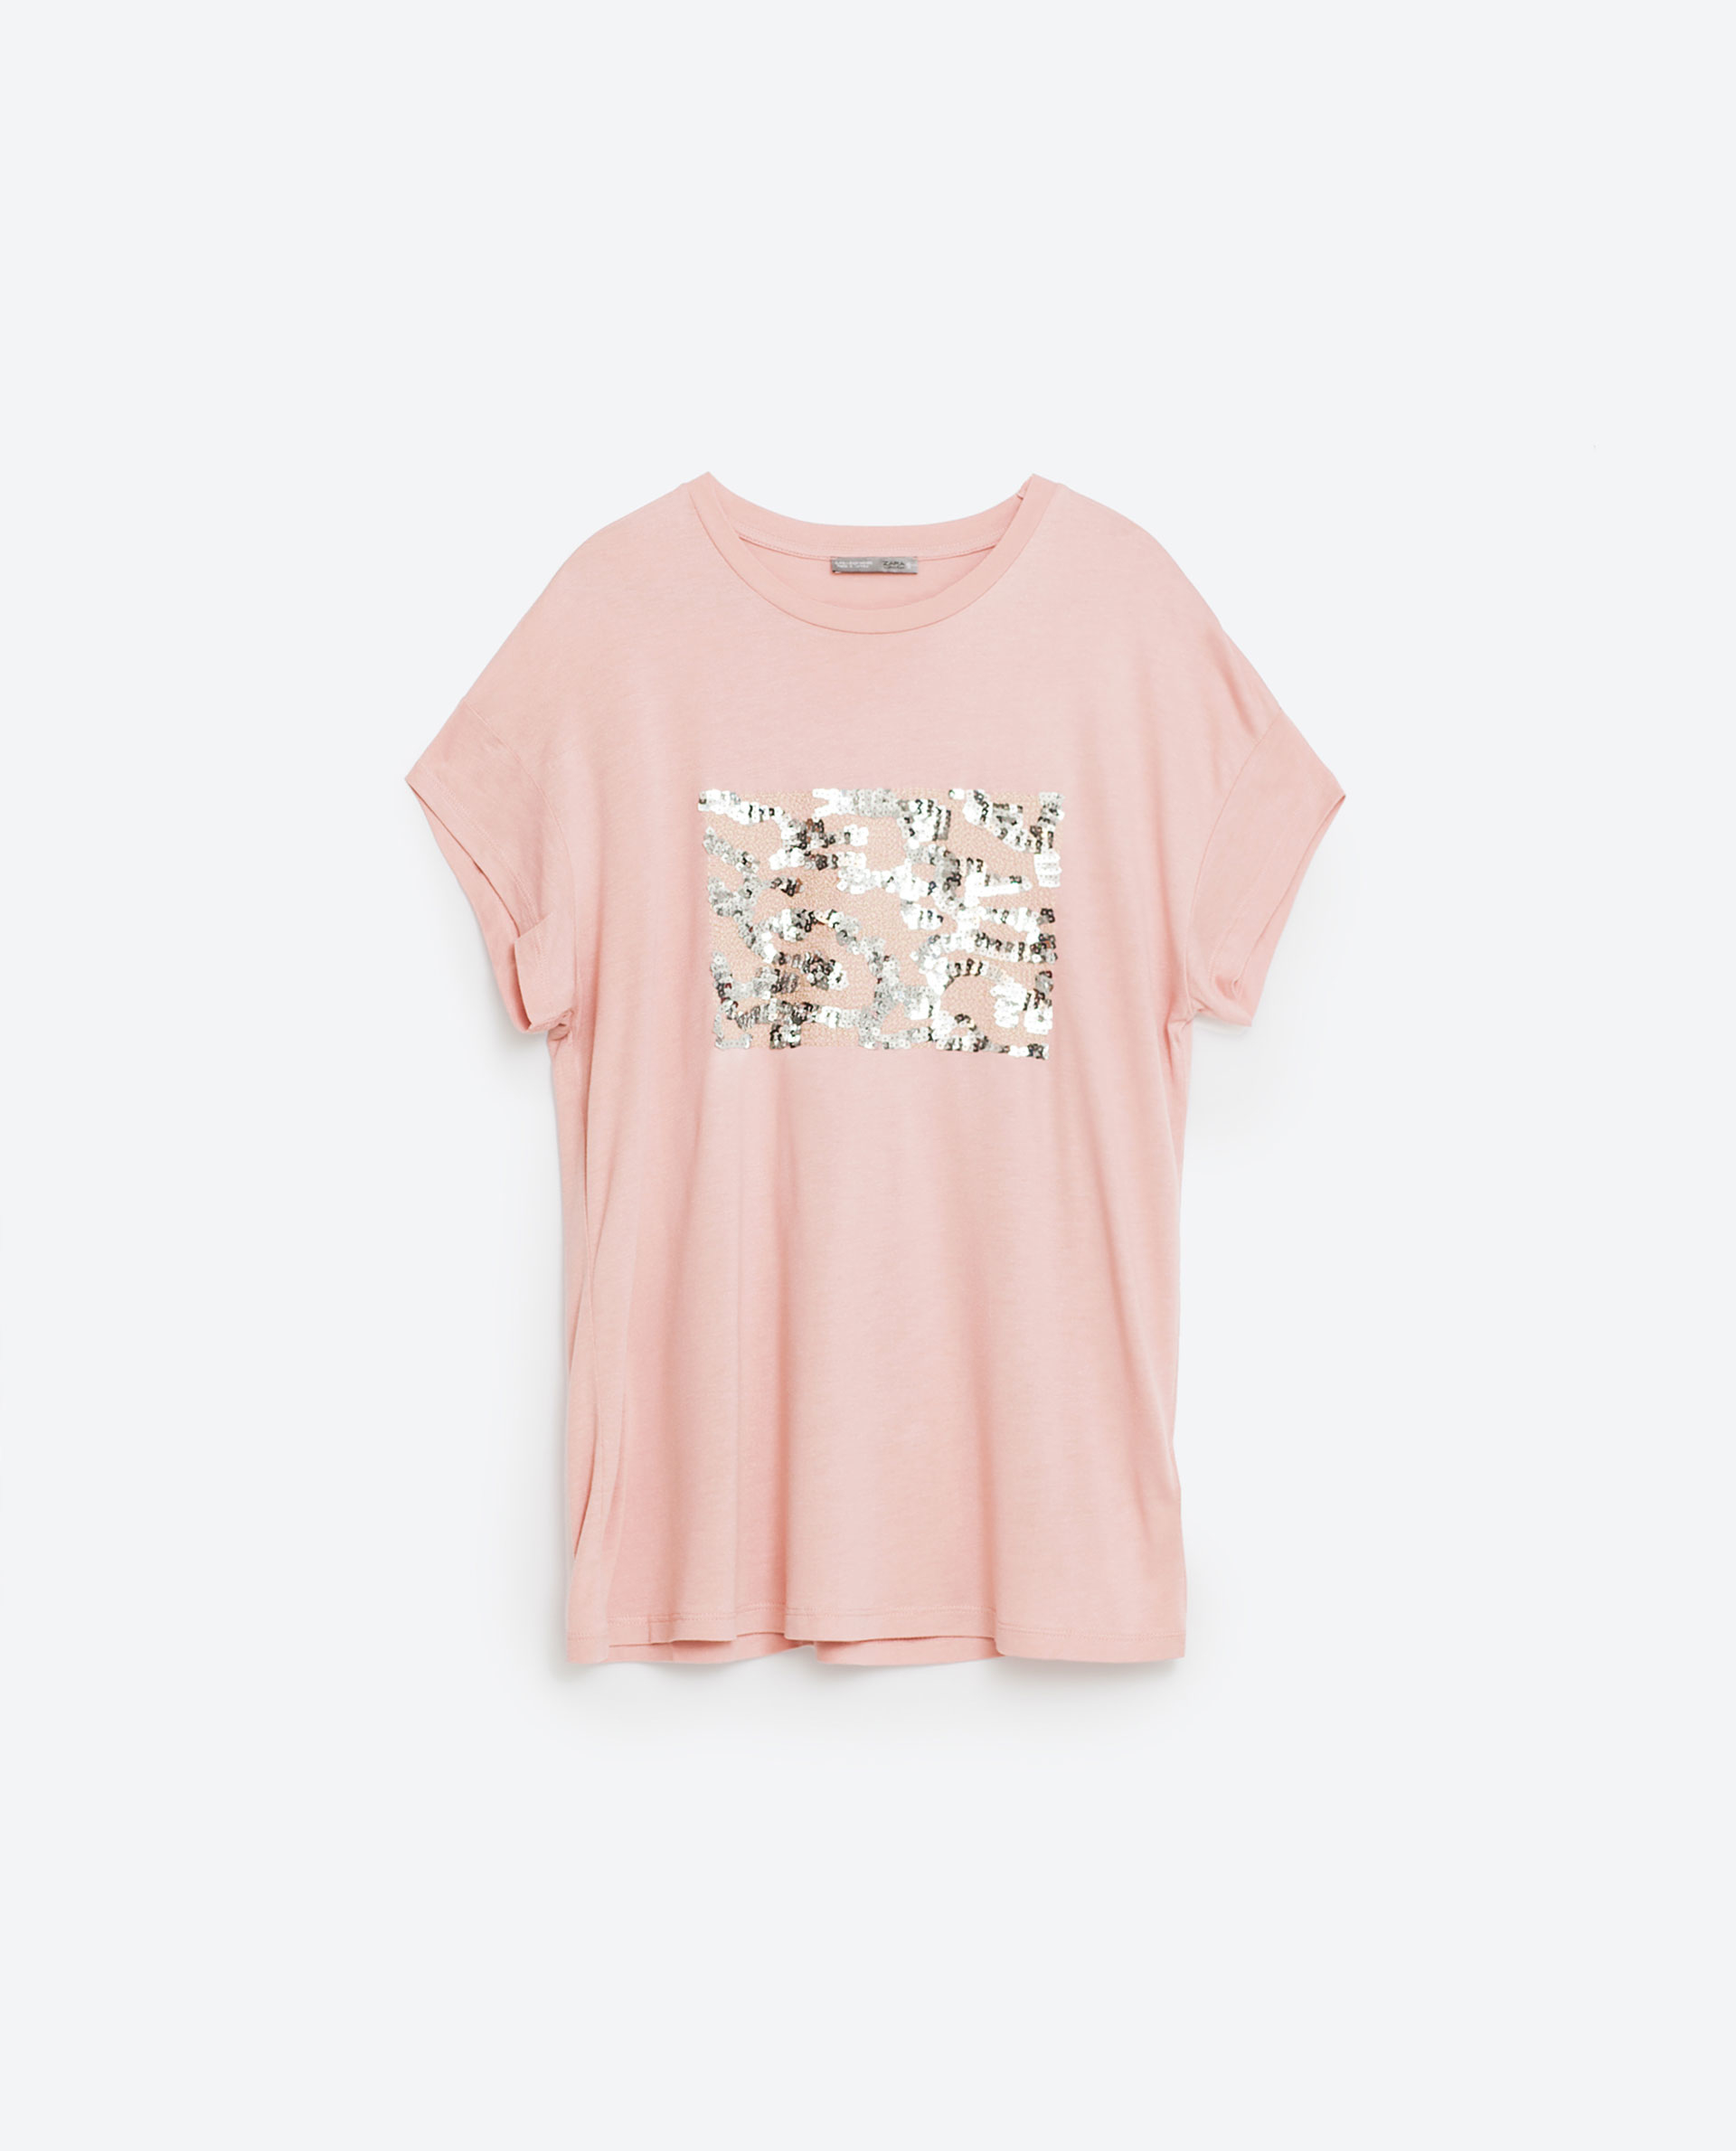 Zara sequin t shirt lyst for Sequin t shirt changing